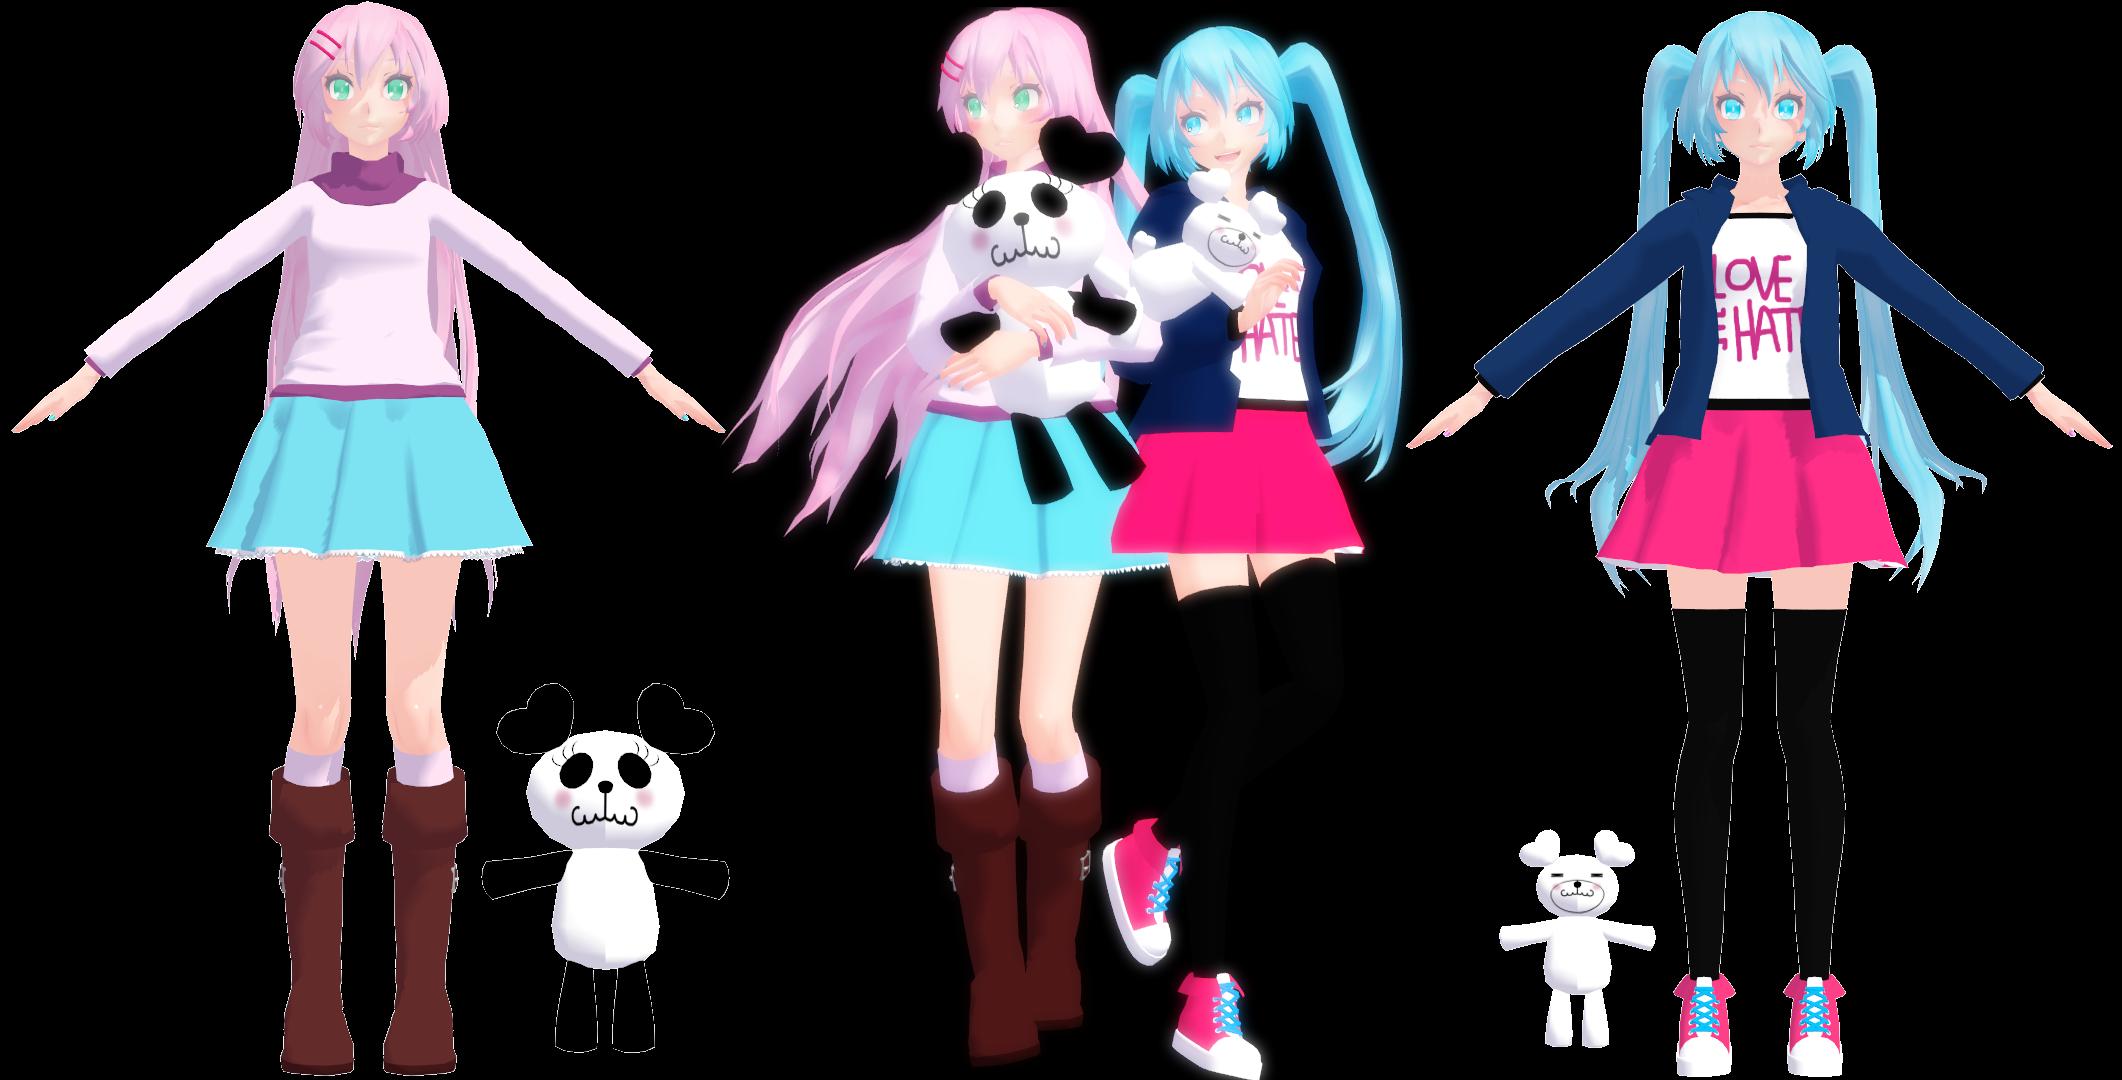 KittyNekkyo                                                                MMD Model DL